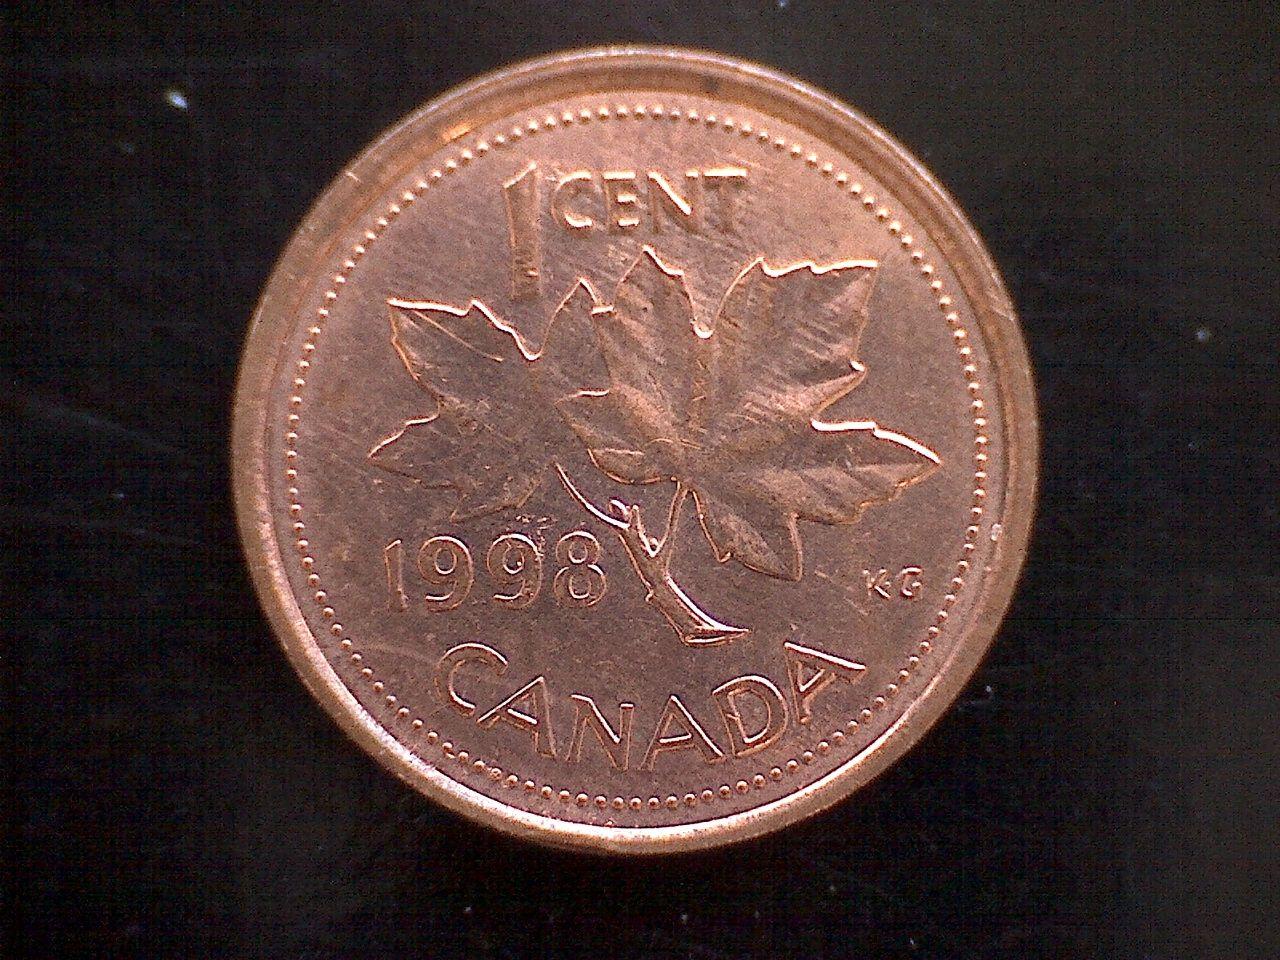 1998 queen elizabeth coin